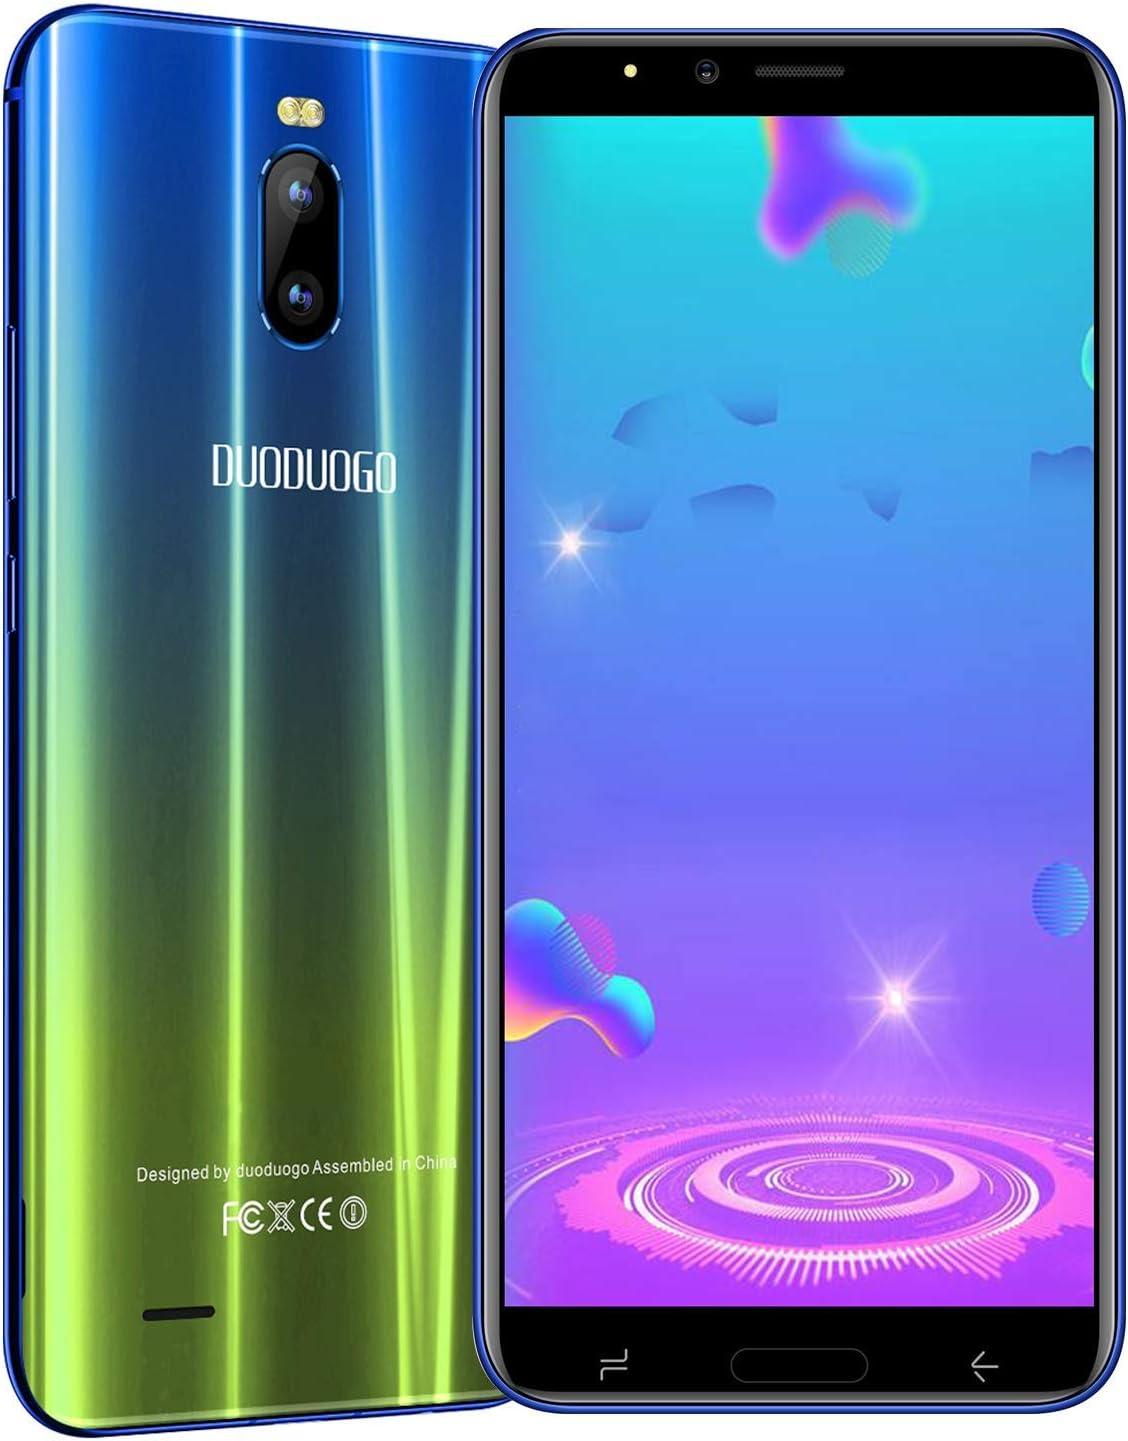 Moviles Libres 4G,6.0 Pulgadas 3GB RAM+16GB ROM/(128GB MAX Expansion),4800mAh Bateria,8MP Camara,Face ID,Dual Sim,Android 7.0 Smartphone Libres DUODUOGO J6+ (Azul): Amazon.es: Electrónica